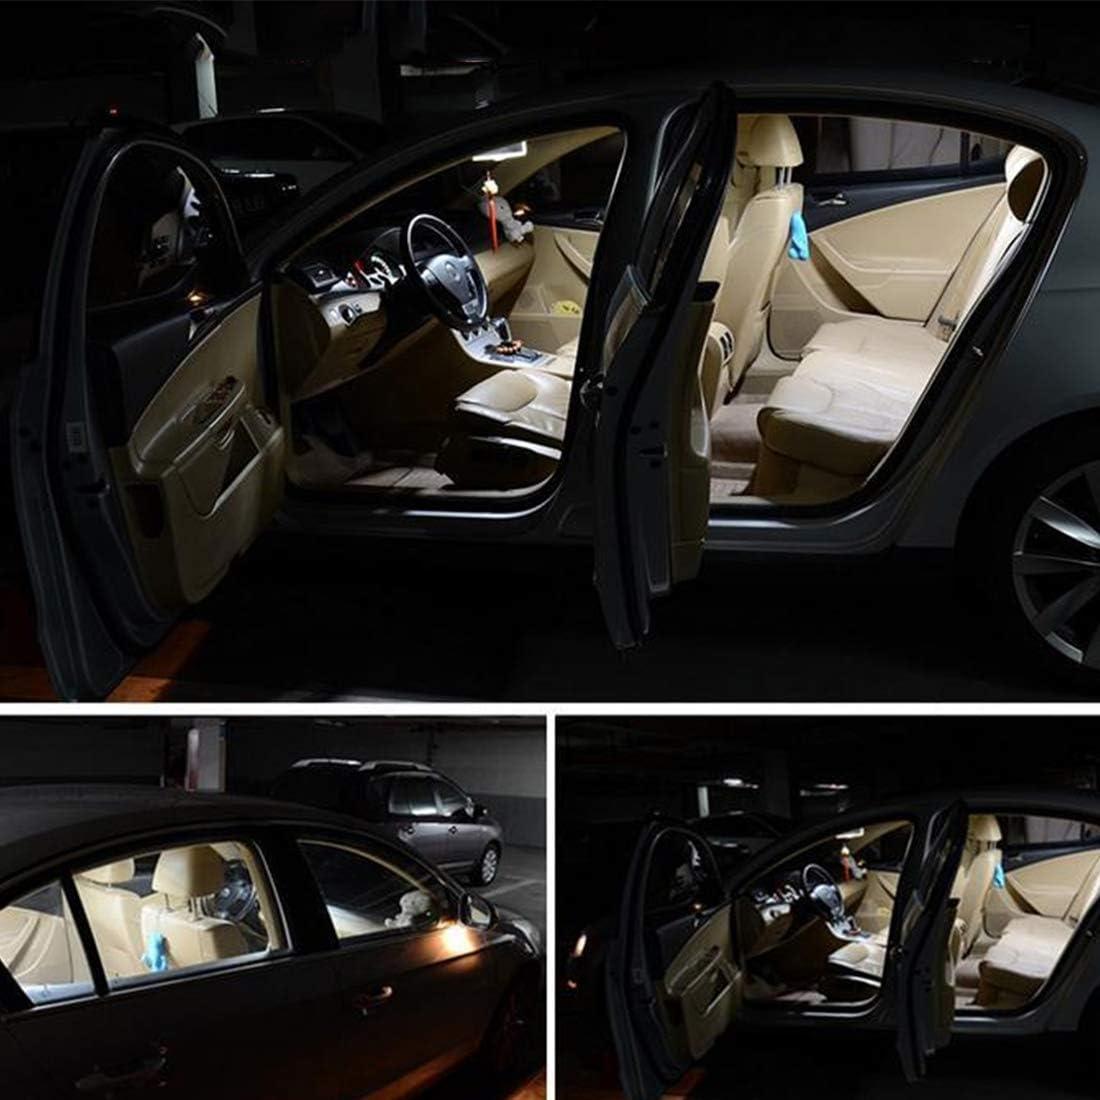 DC 12V Color : White Light Auto-Innenbeleuchtung 2 PCS 2W 100 LM 6000K 41MM Bicuspid Portauto-Dome-Lampe LED-Leselicht mit 16 SMD-4014 LED-Lampen wei/ßes Licht Auto-Innenleuchten